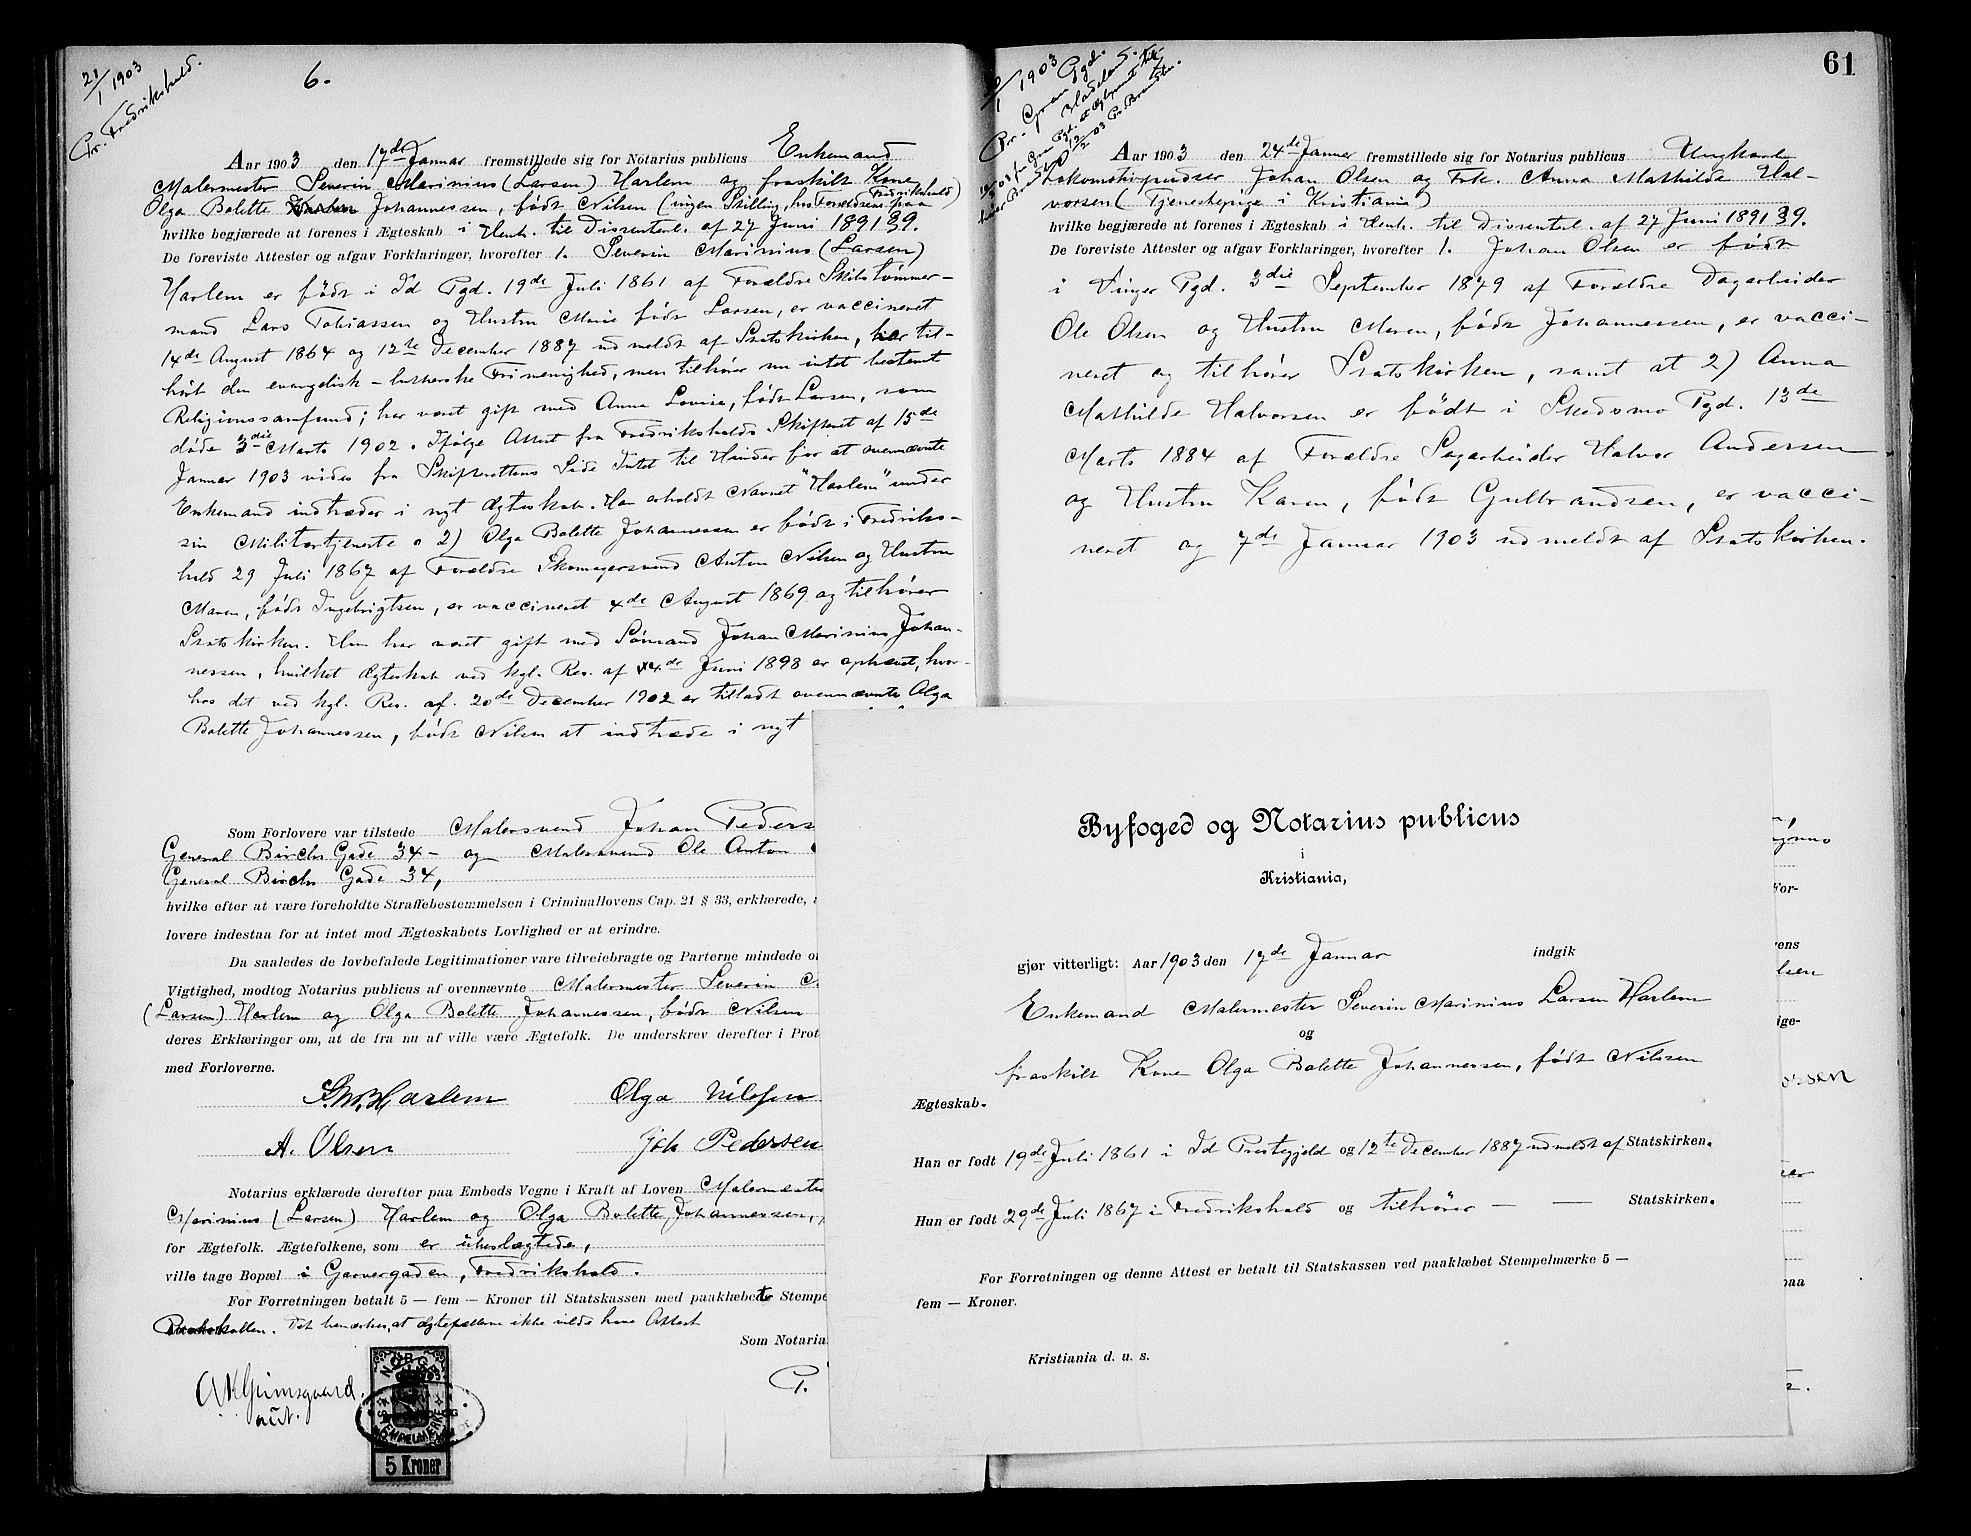 SAO, Oslo byfogd avd. I, L/Lb/Lbb/L0006: Notarialprotokoll, rekke II: Vigsler, 1902-1907, s. 60b-61a